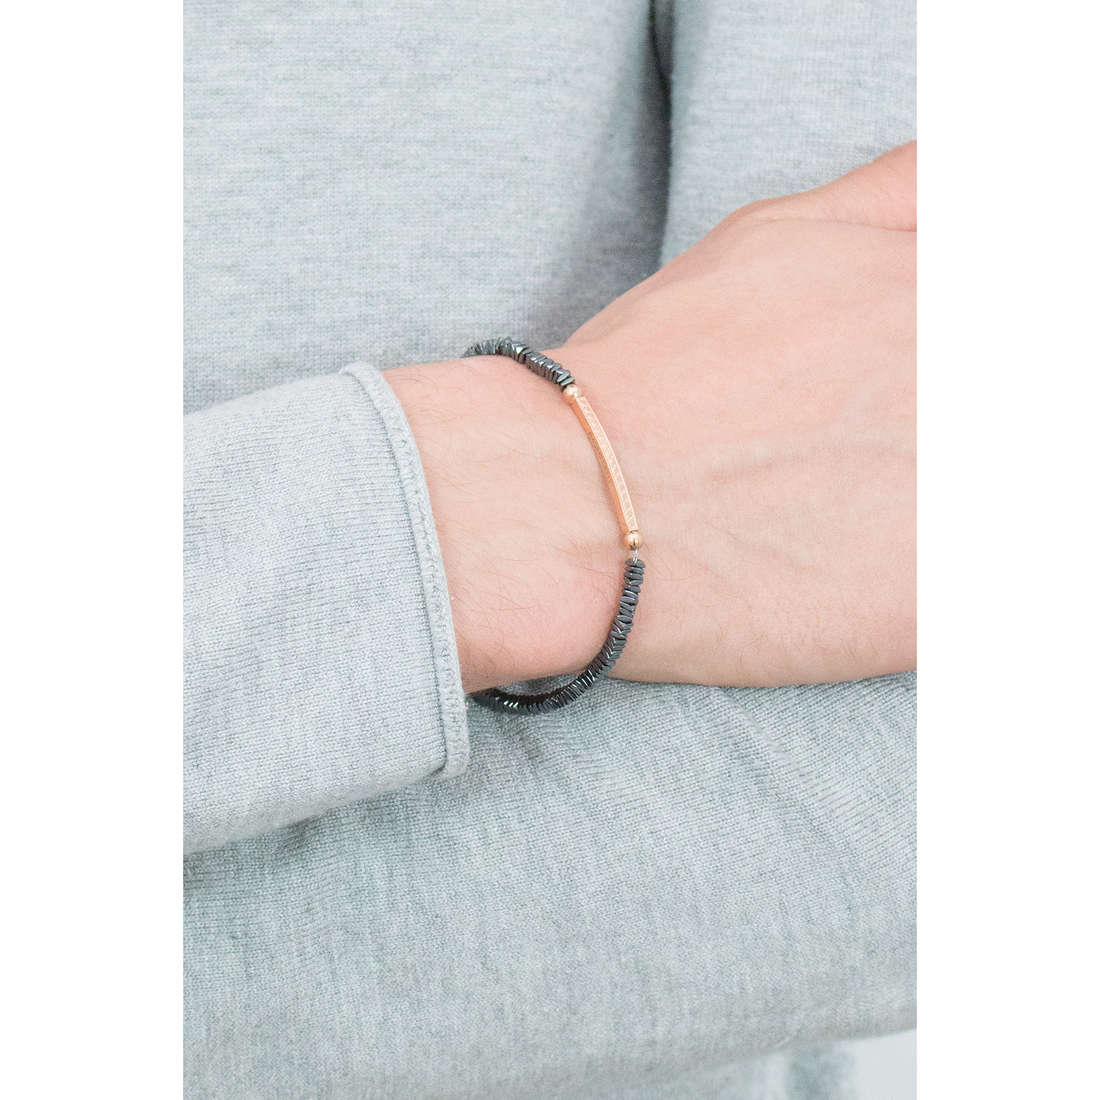 Morellato bracciali Ematite uomo SAHT02 indosso